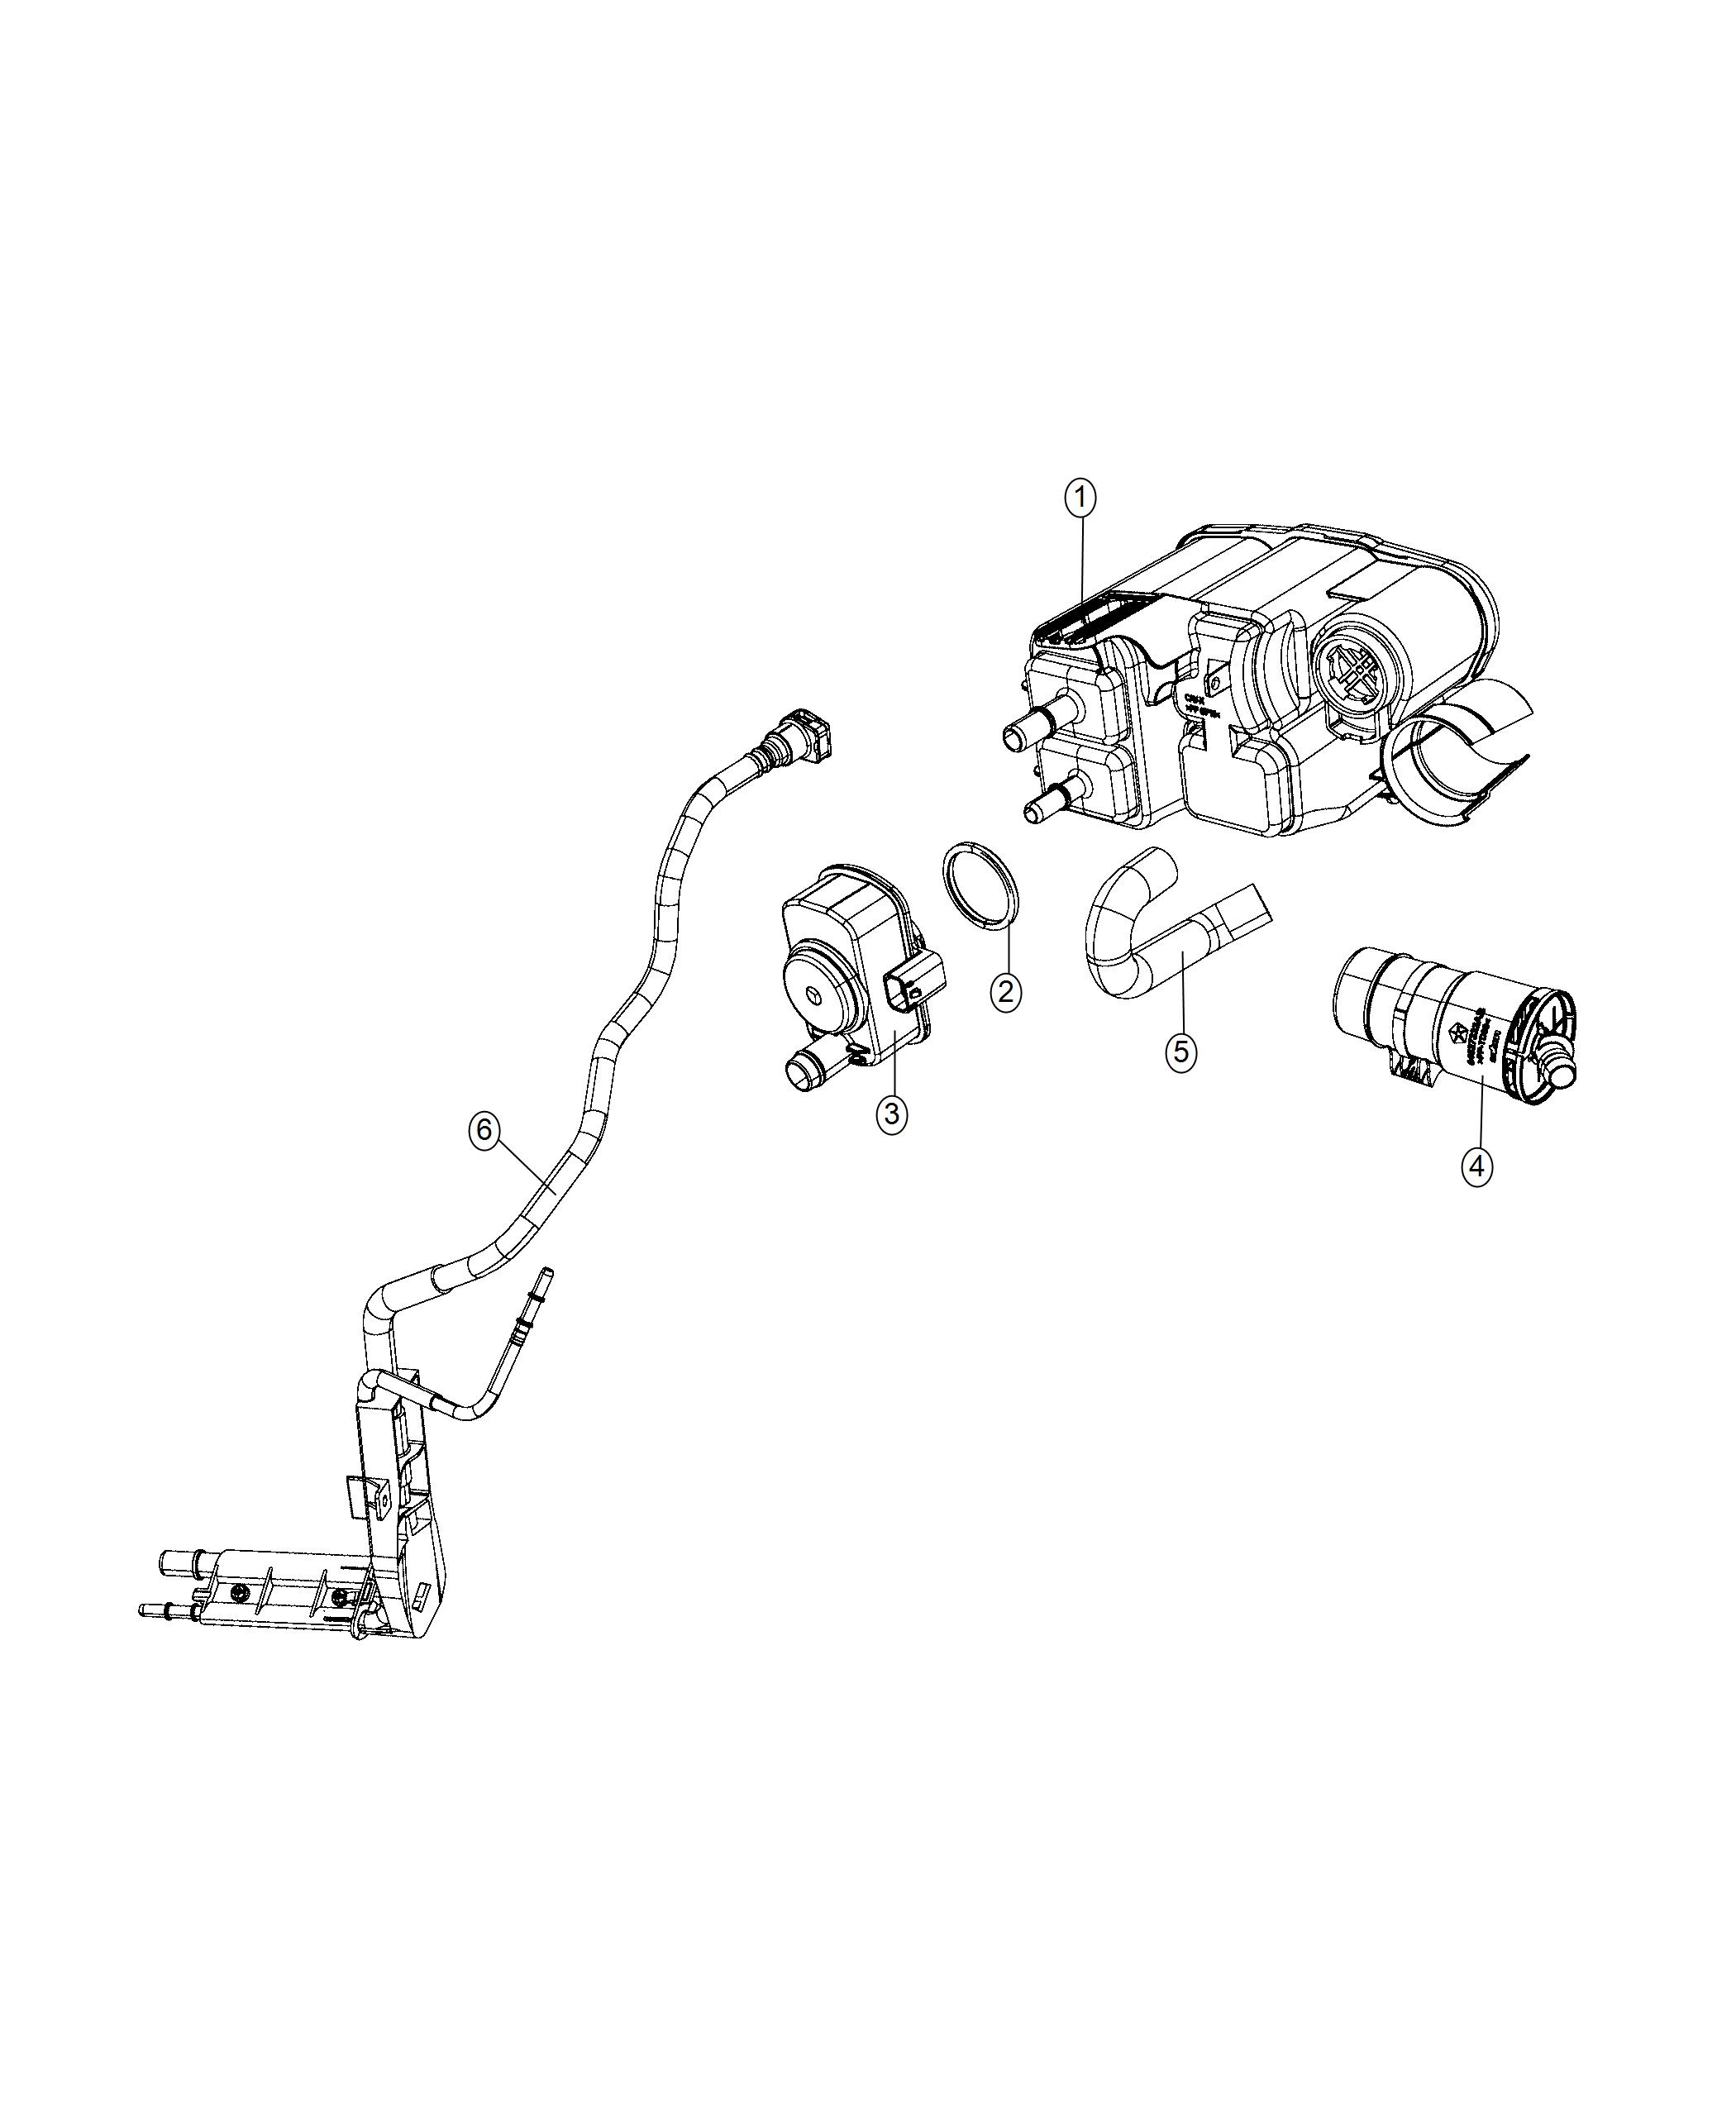 Chrysler 3 6l Vvt Engine Diagram